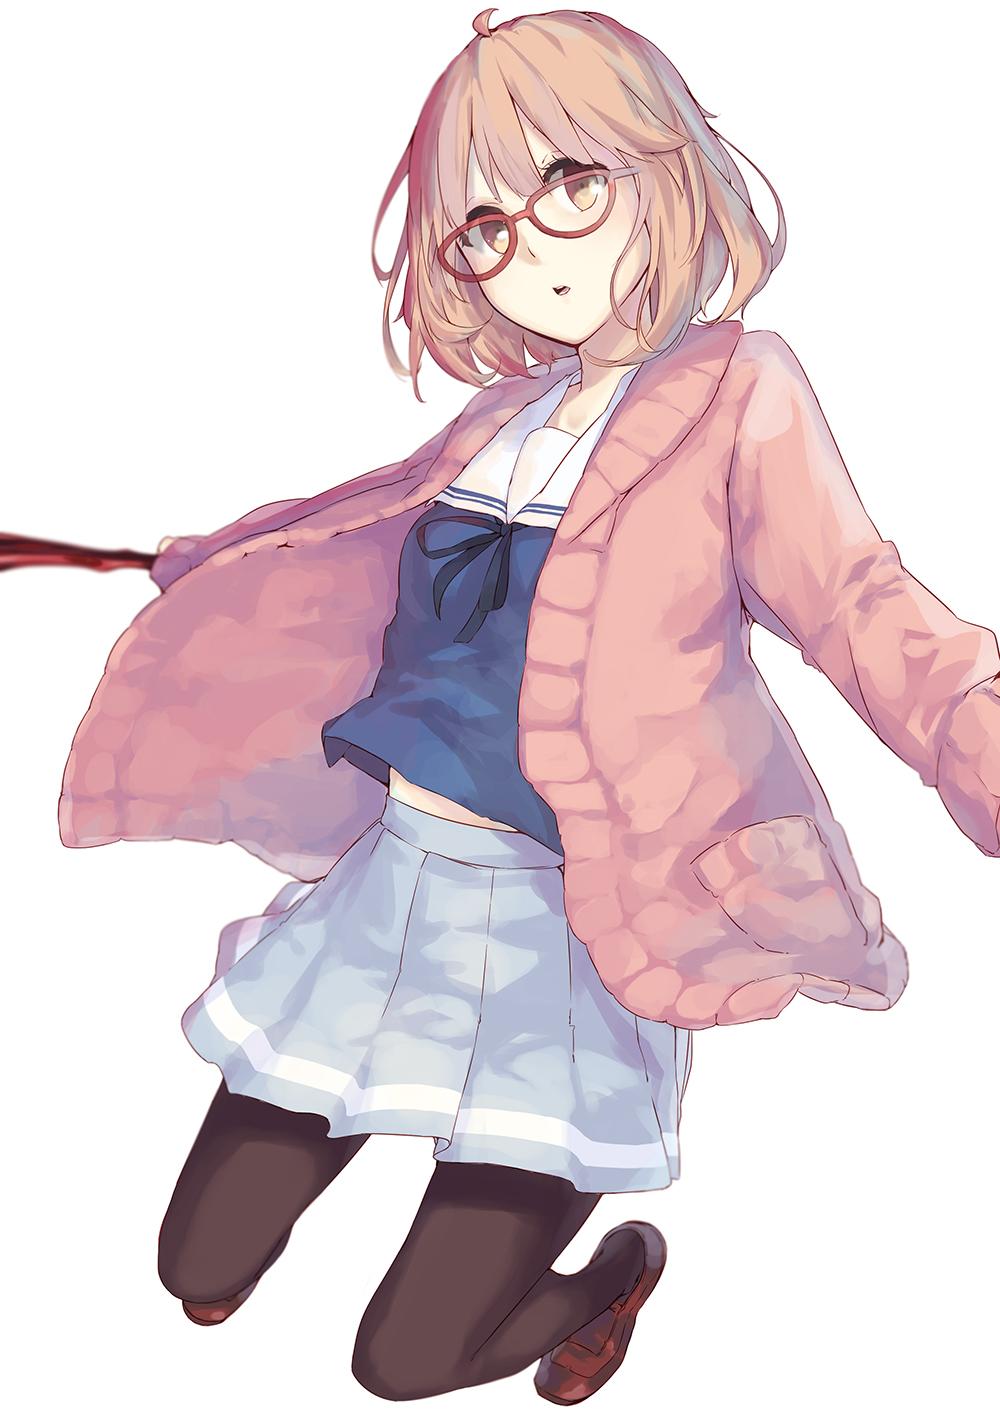 Hentai anime eng sub mahoushoujoisukaep3 - 5 3